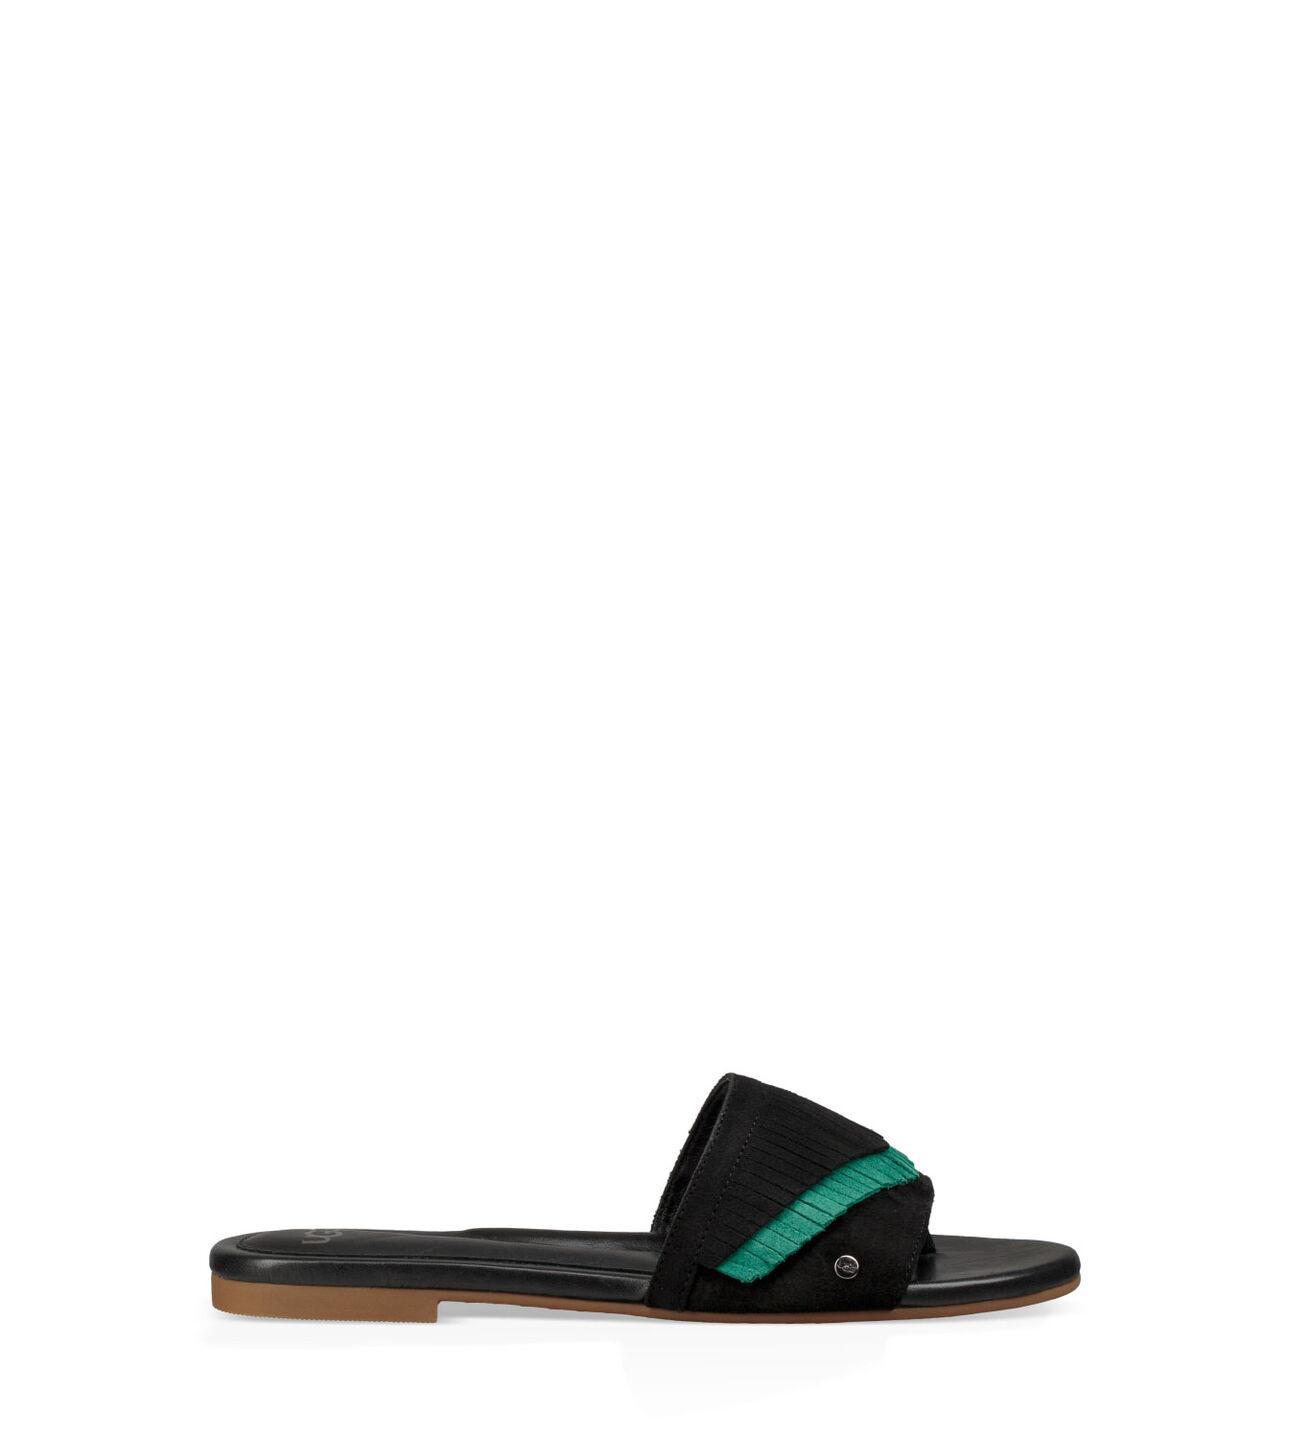 92ce9b47d43 UGG® | Women's Binx Slide Sandal | Free Shipping on UGG.com